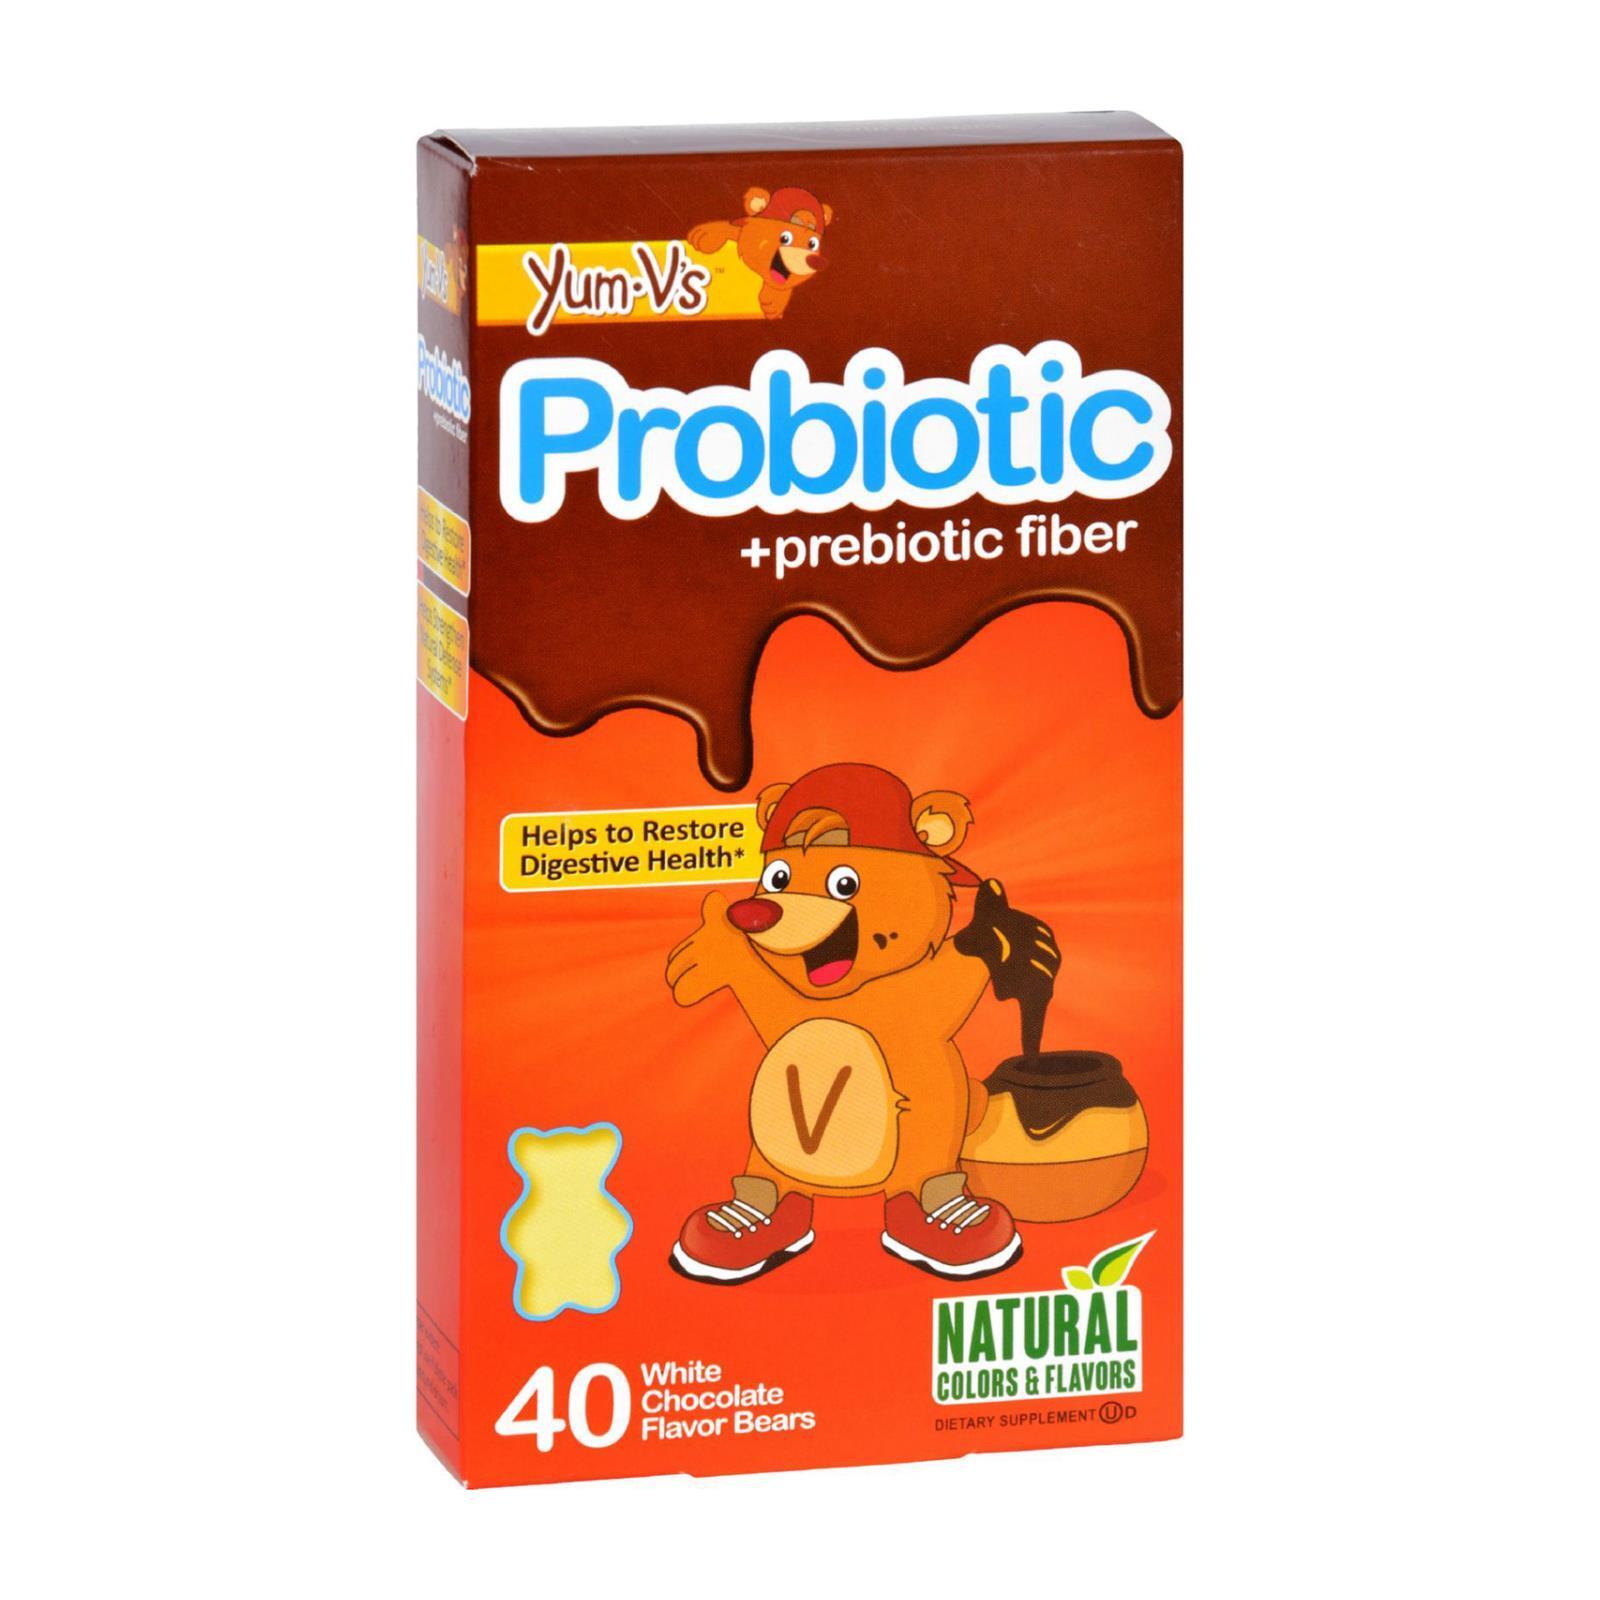 Yum V's Probiotic Plus Prebiotic Fiber Vanilla - 40 Bears